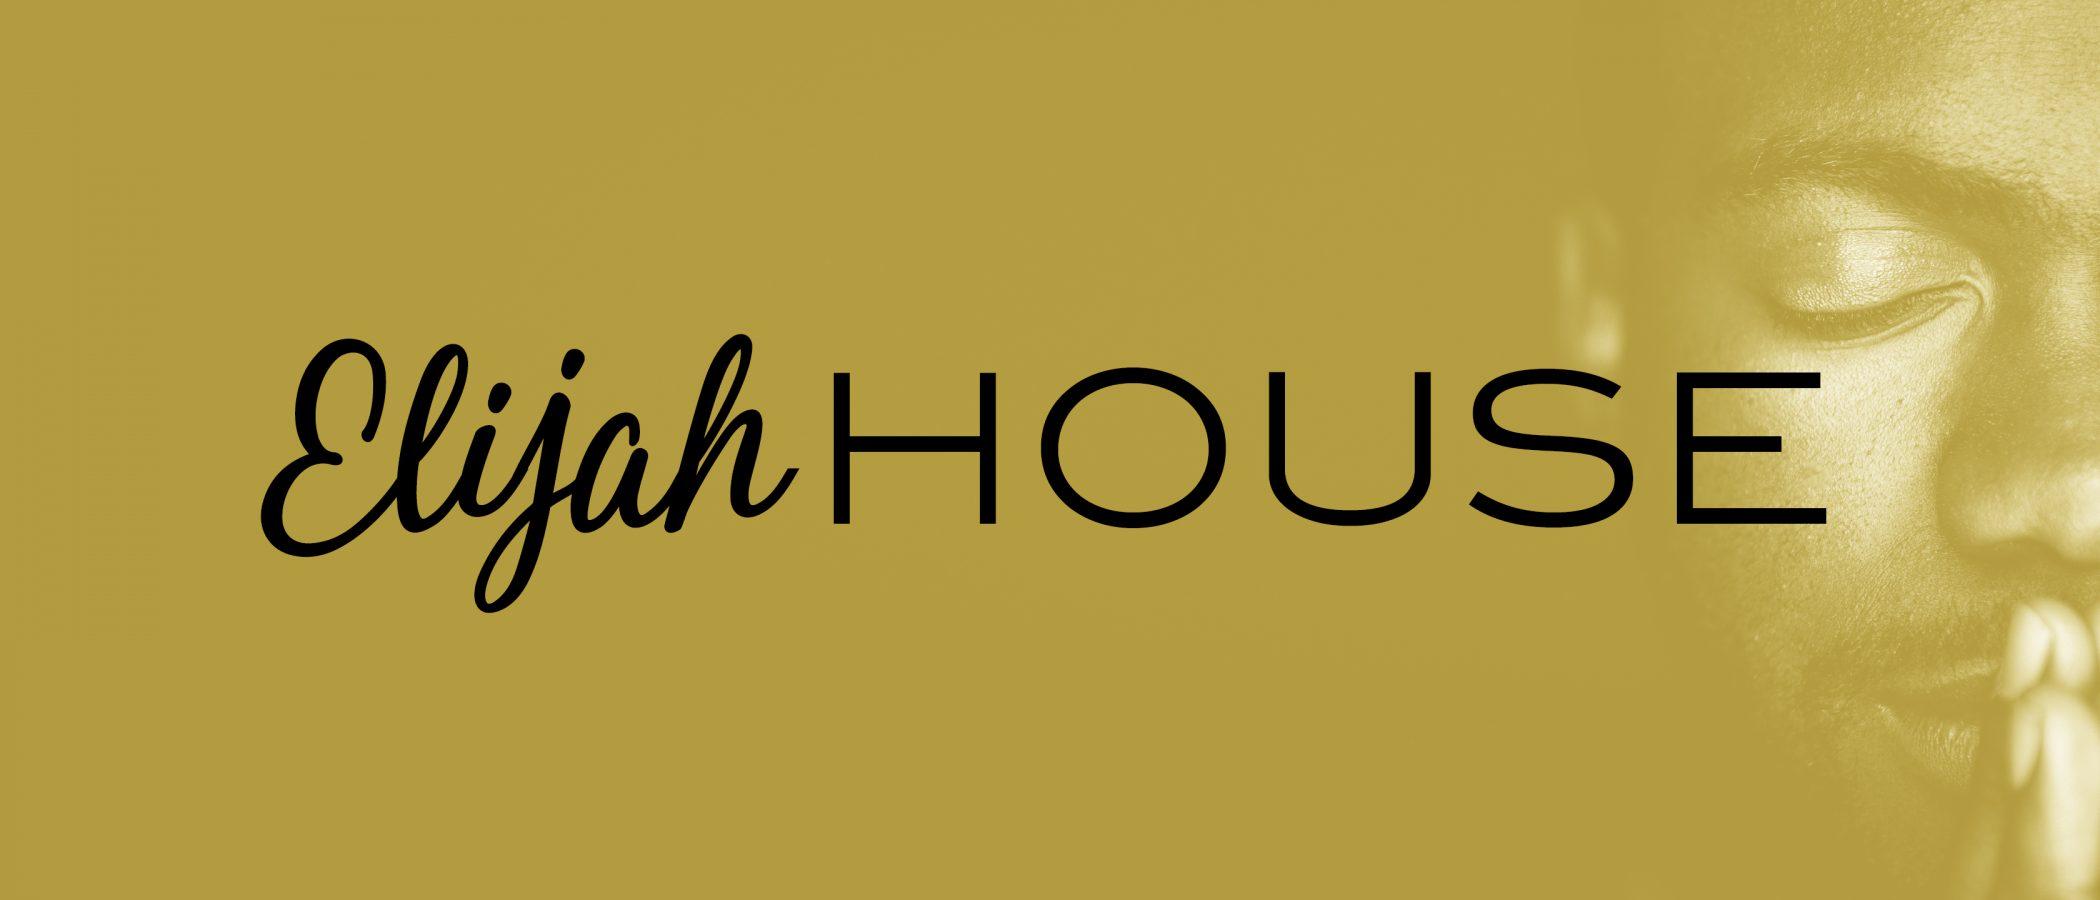 elijah-house-11brd-dq2021-web-banner2x-100